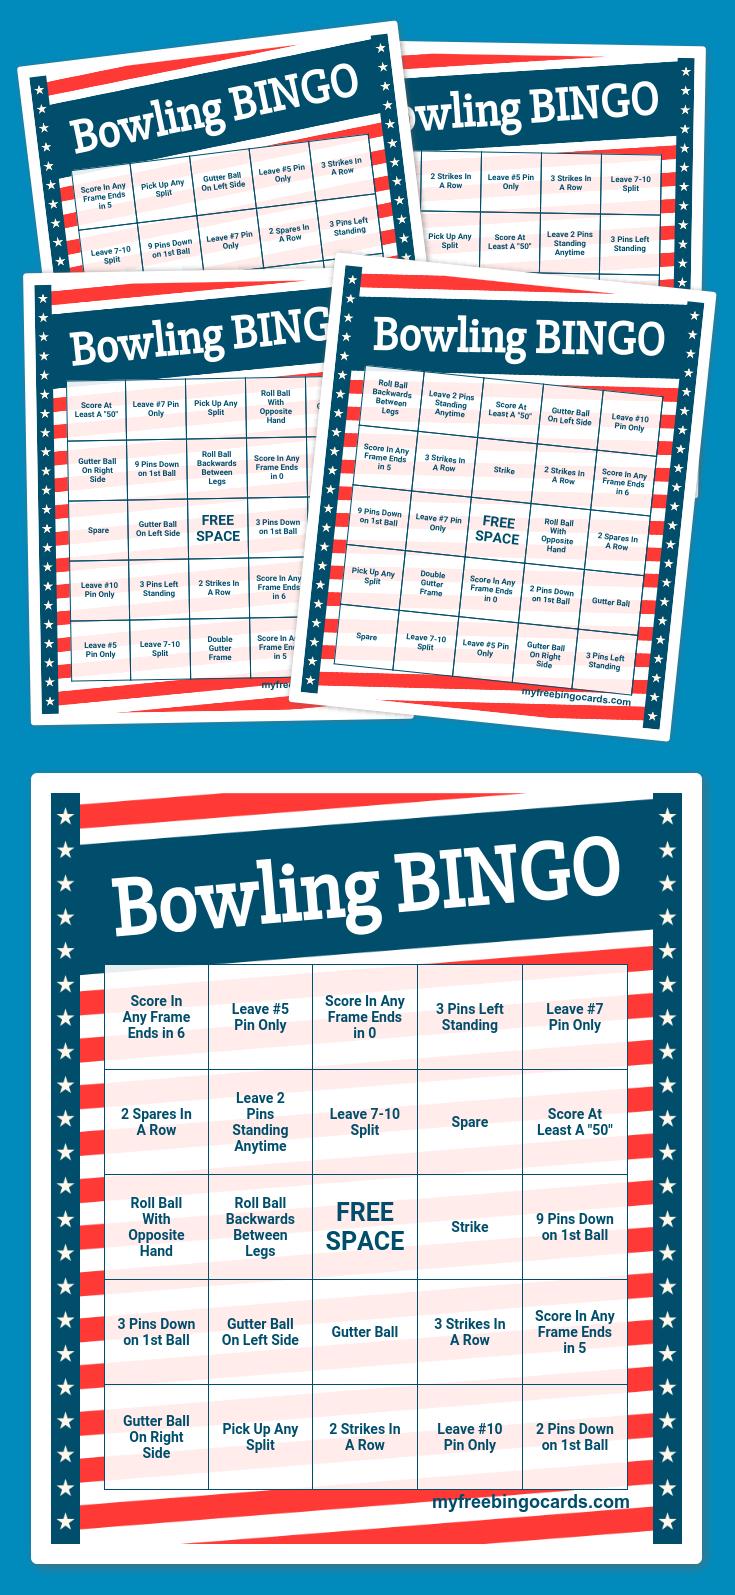 Bowling Bingo | Bingo Card Generator, Bingo Printable, Bingo